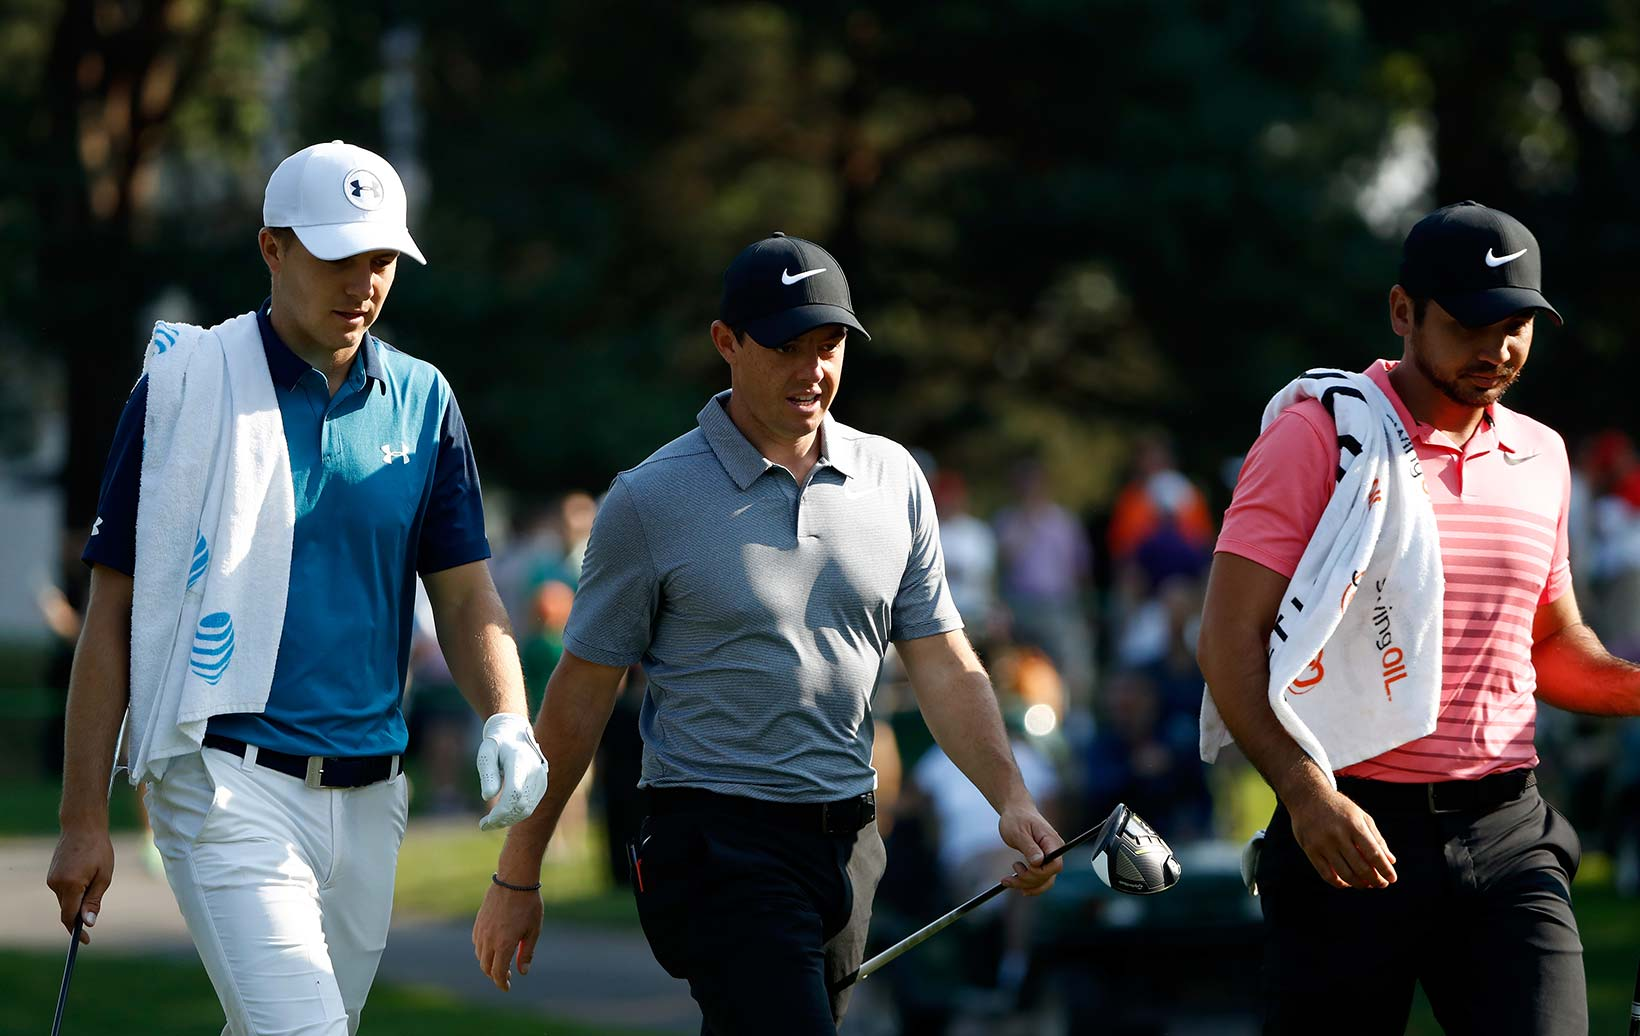 2017 WGC Bridgestone Invitational: Round 1 - Jordan, Rory and Jason Walk Off the Tee Box